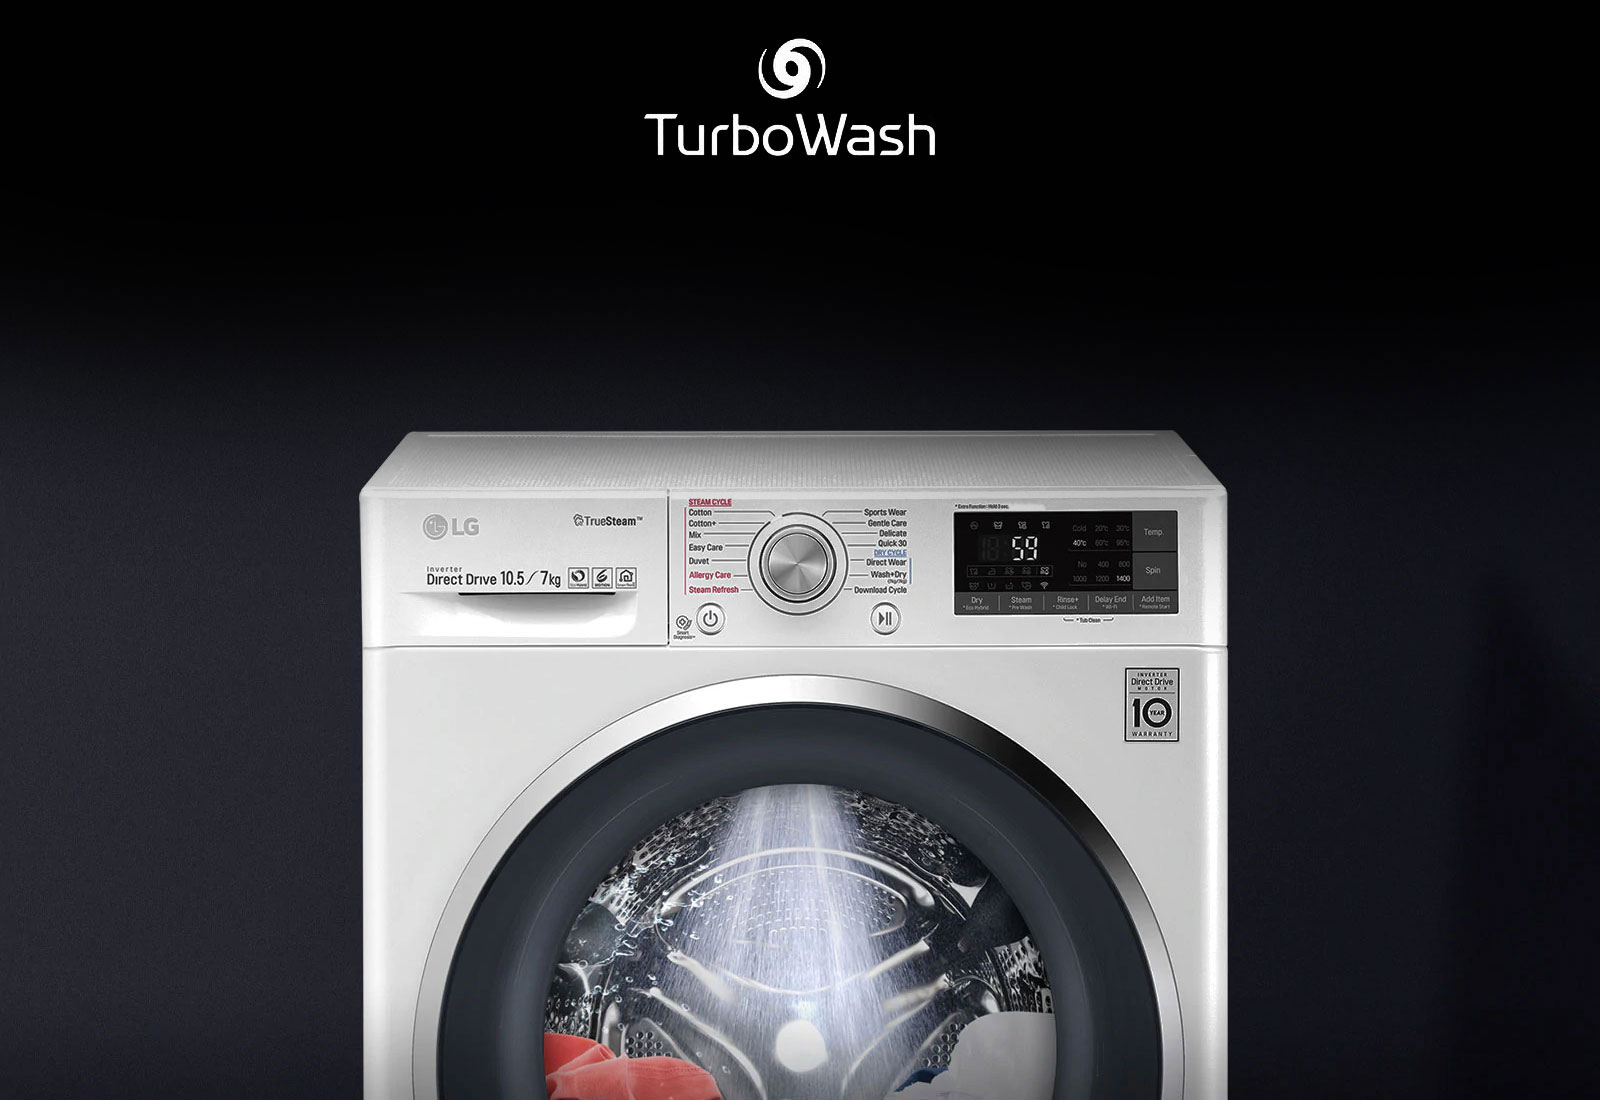 LG FHV1409ZWB Turbo wash